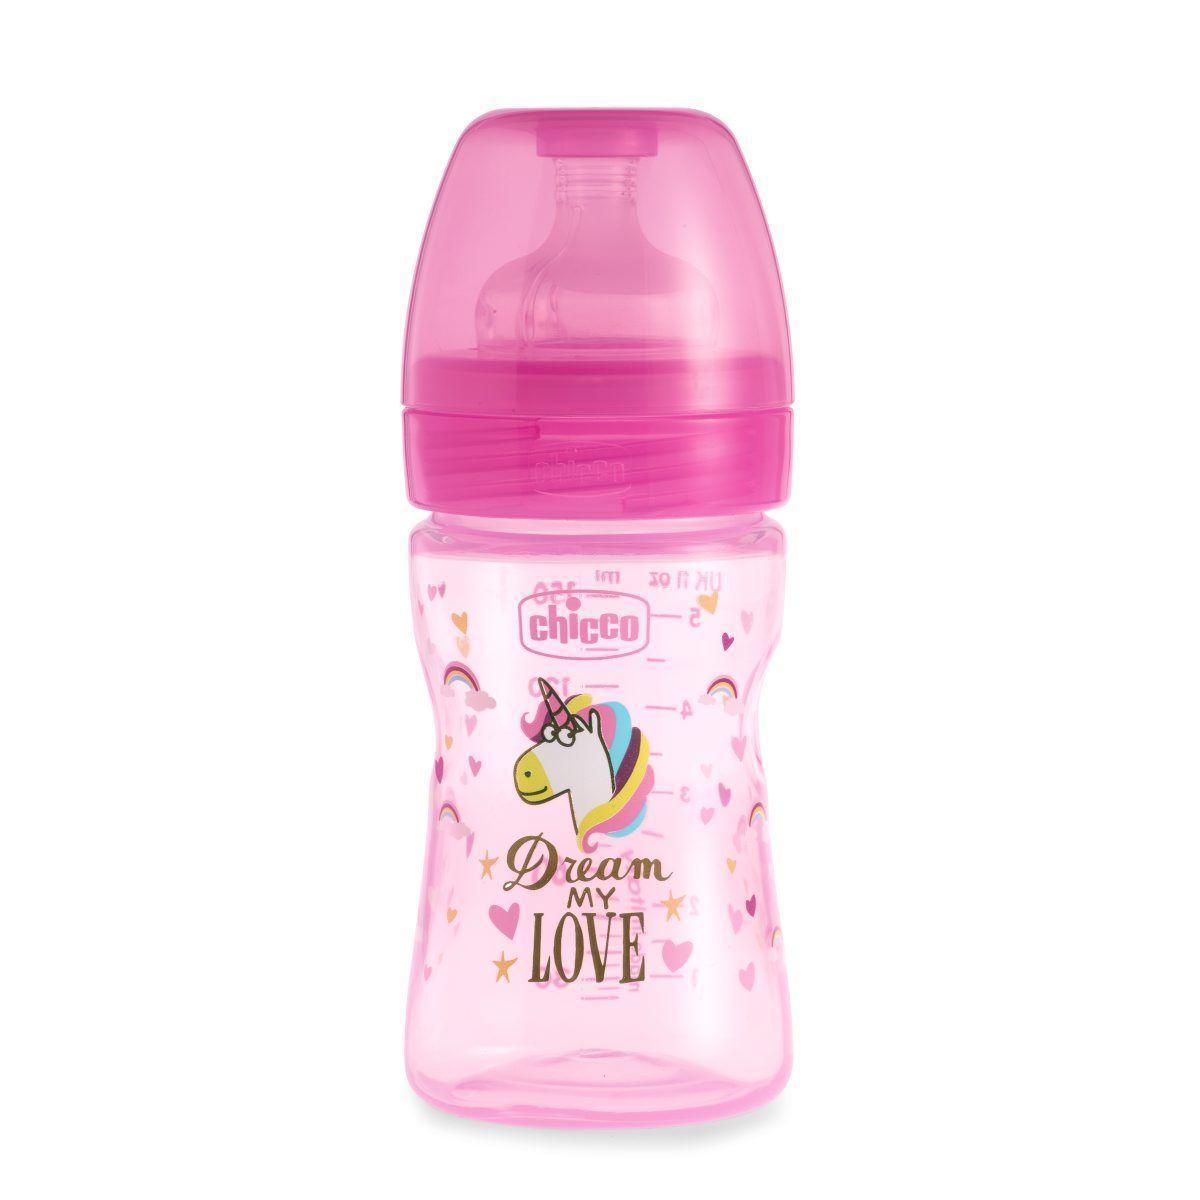 Пляшечка пластик Chicco Well-Being Love, 150мл, соска силікон, 0m+